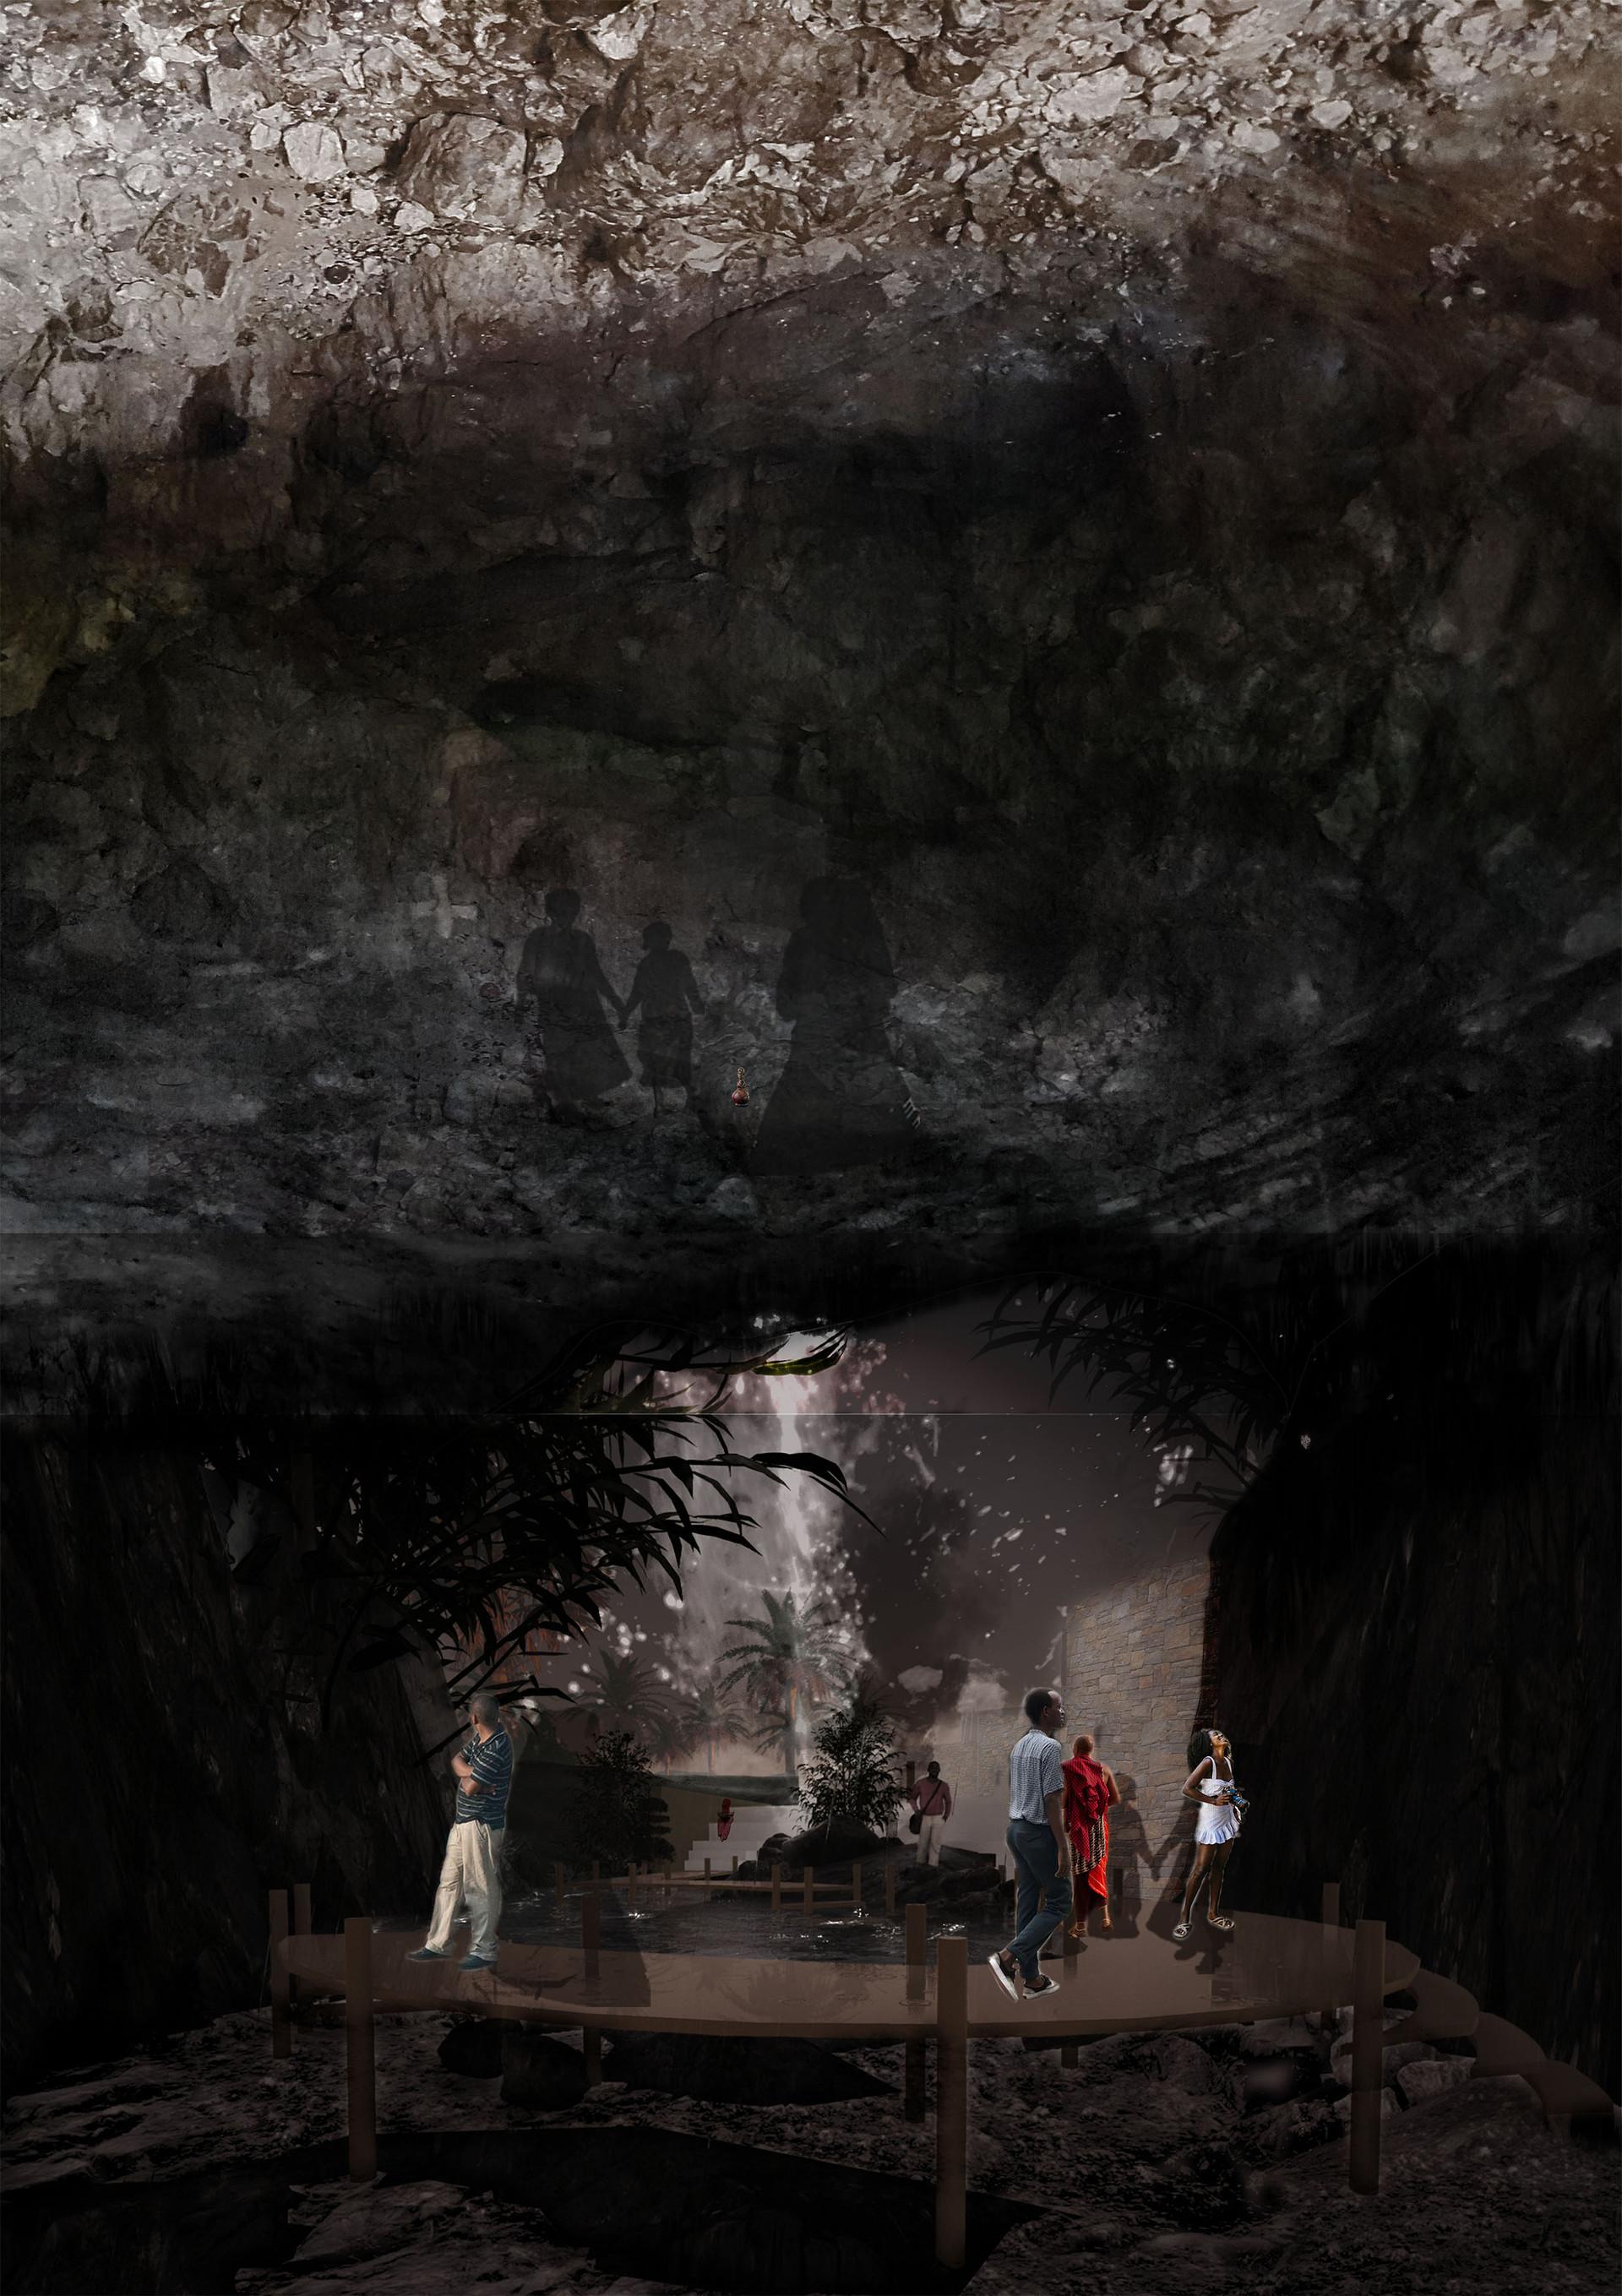 Cave – Tourist experience. Gomba, ZA. Unit 15X. 2020.